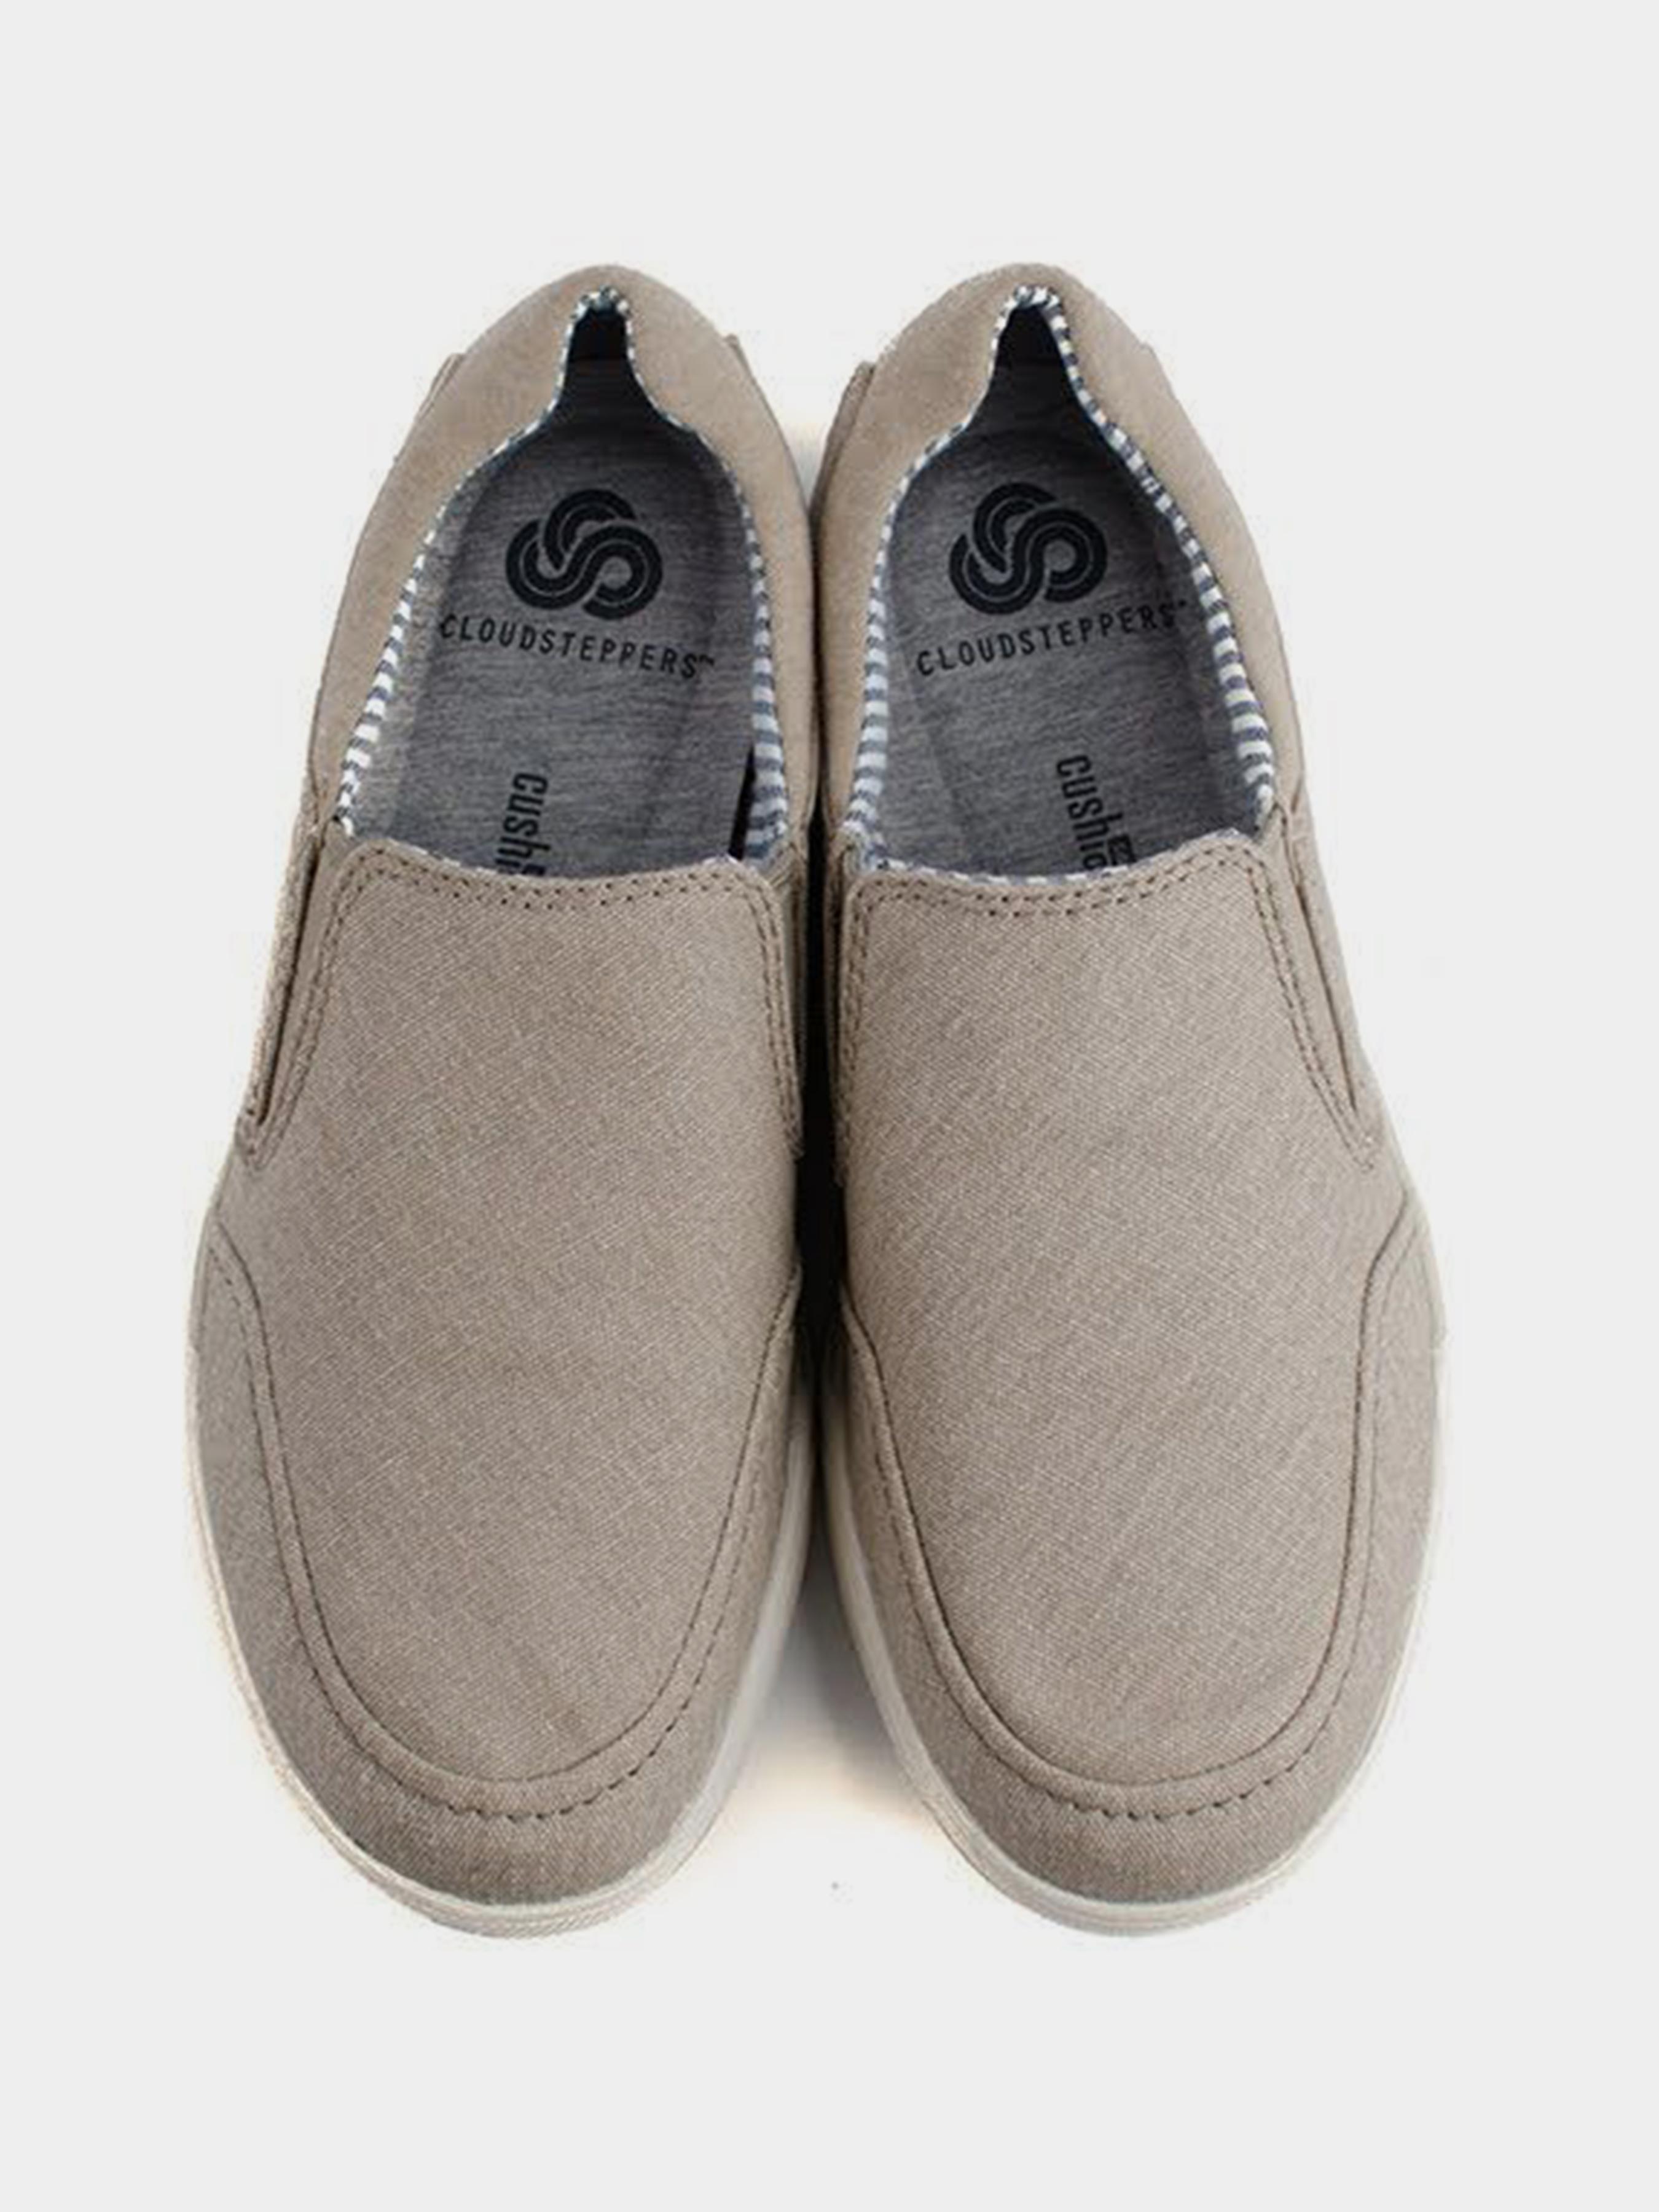 Cлипоны для мужчин Clarks Step Isle Slip OM2856 модная обувь, 2017